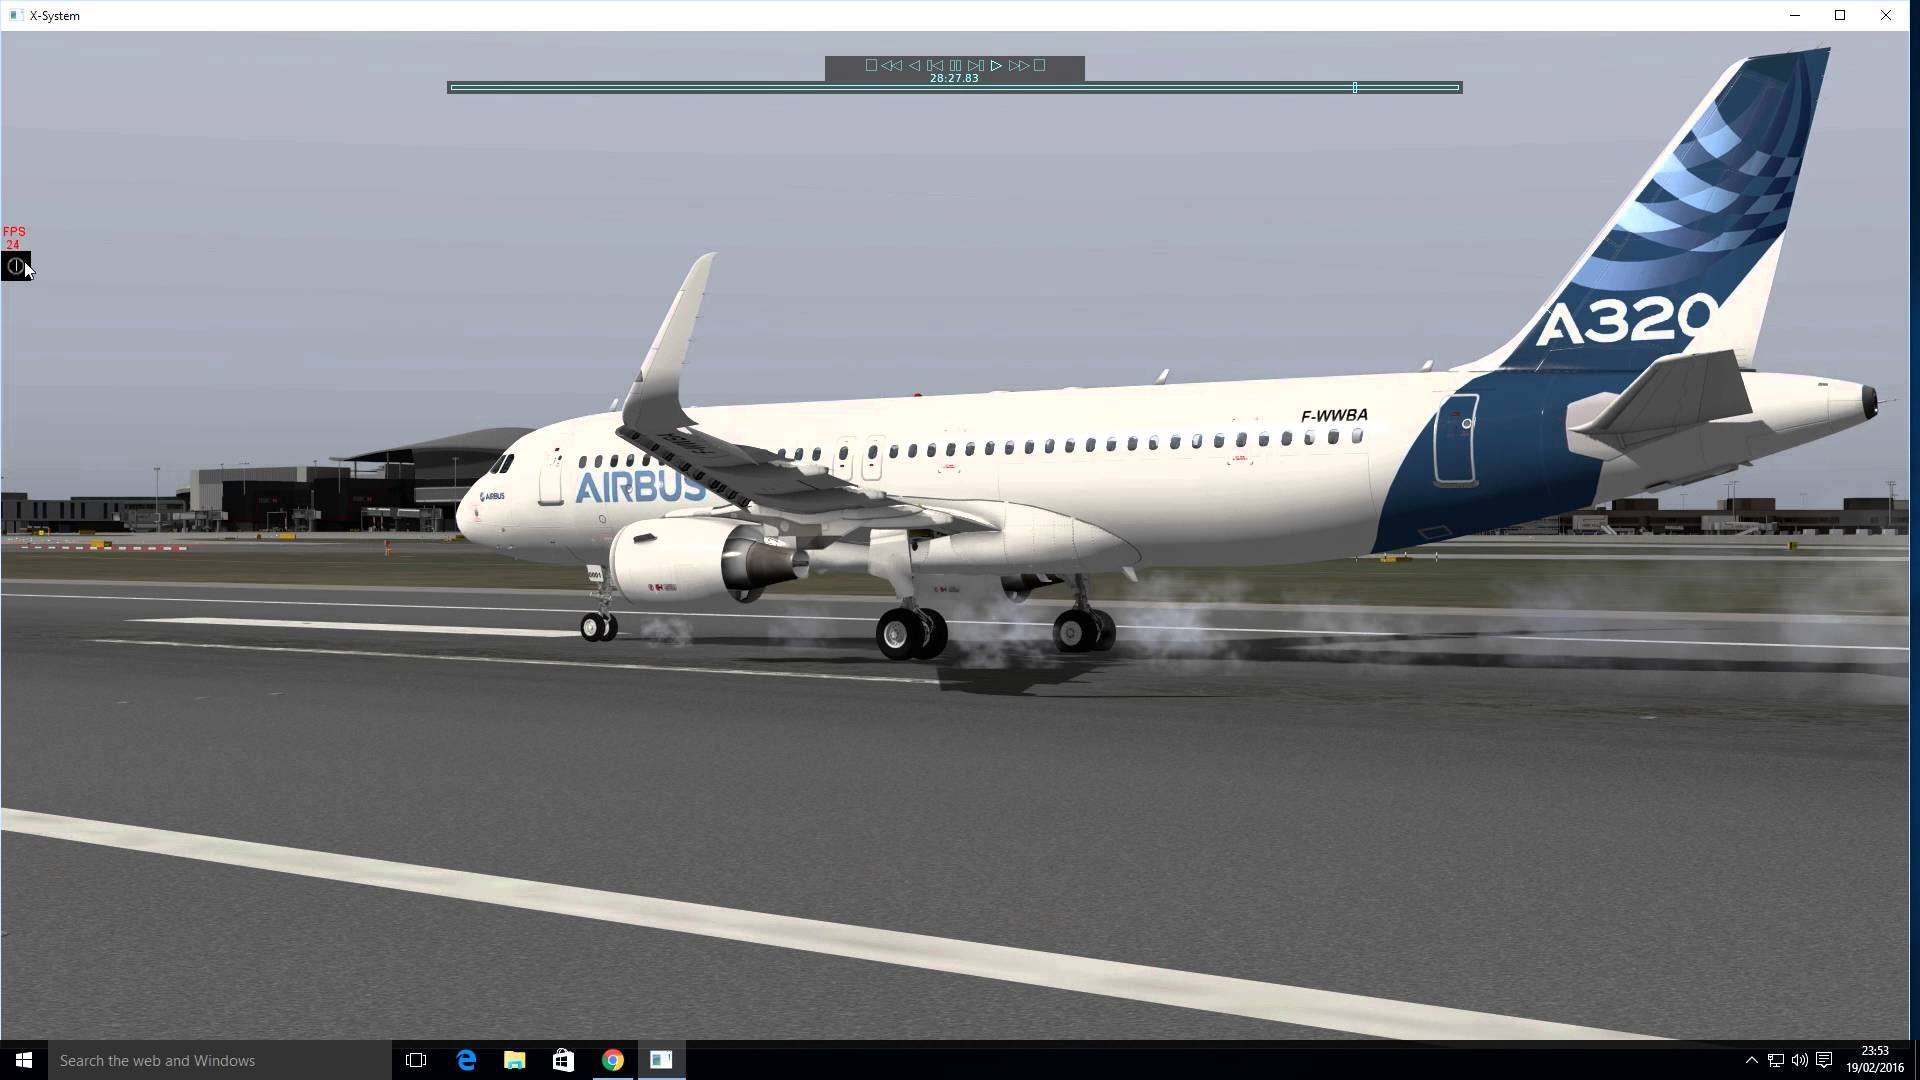 X Plane 10 JAR Design A320 Neo | Best PC Simulation Games | Jar